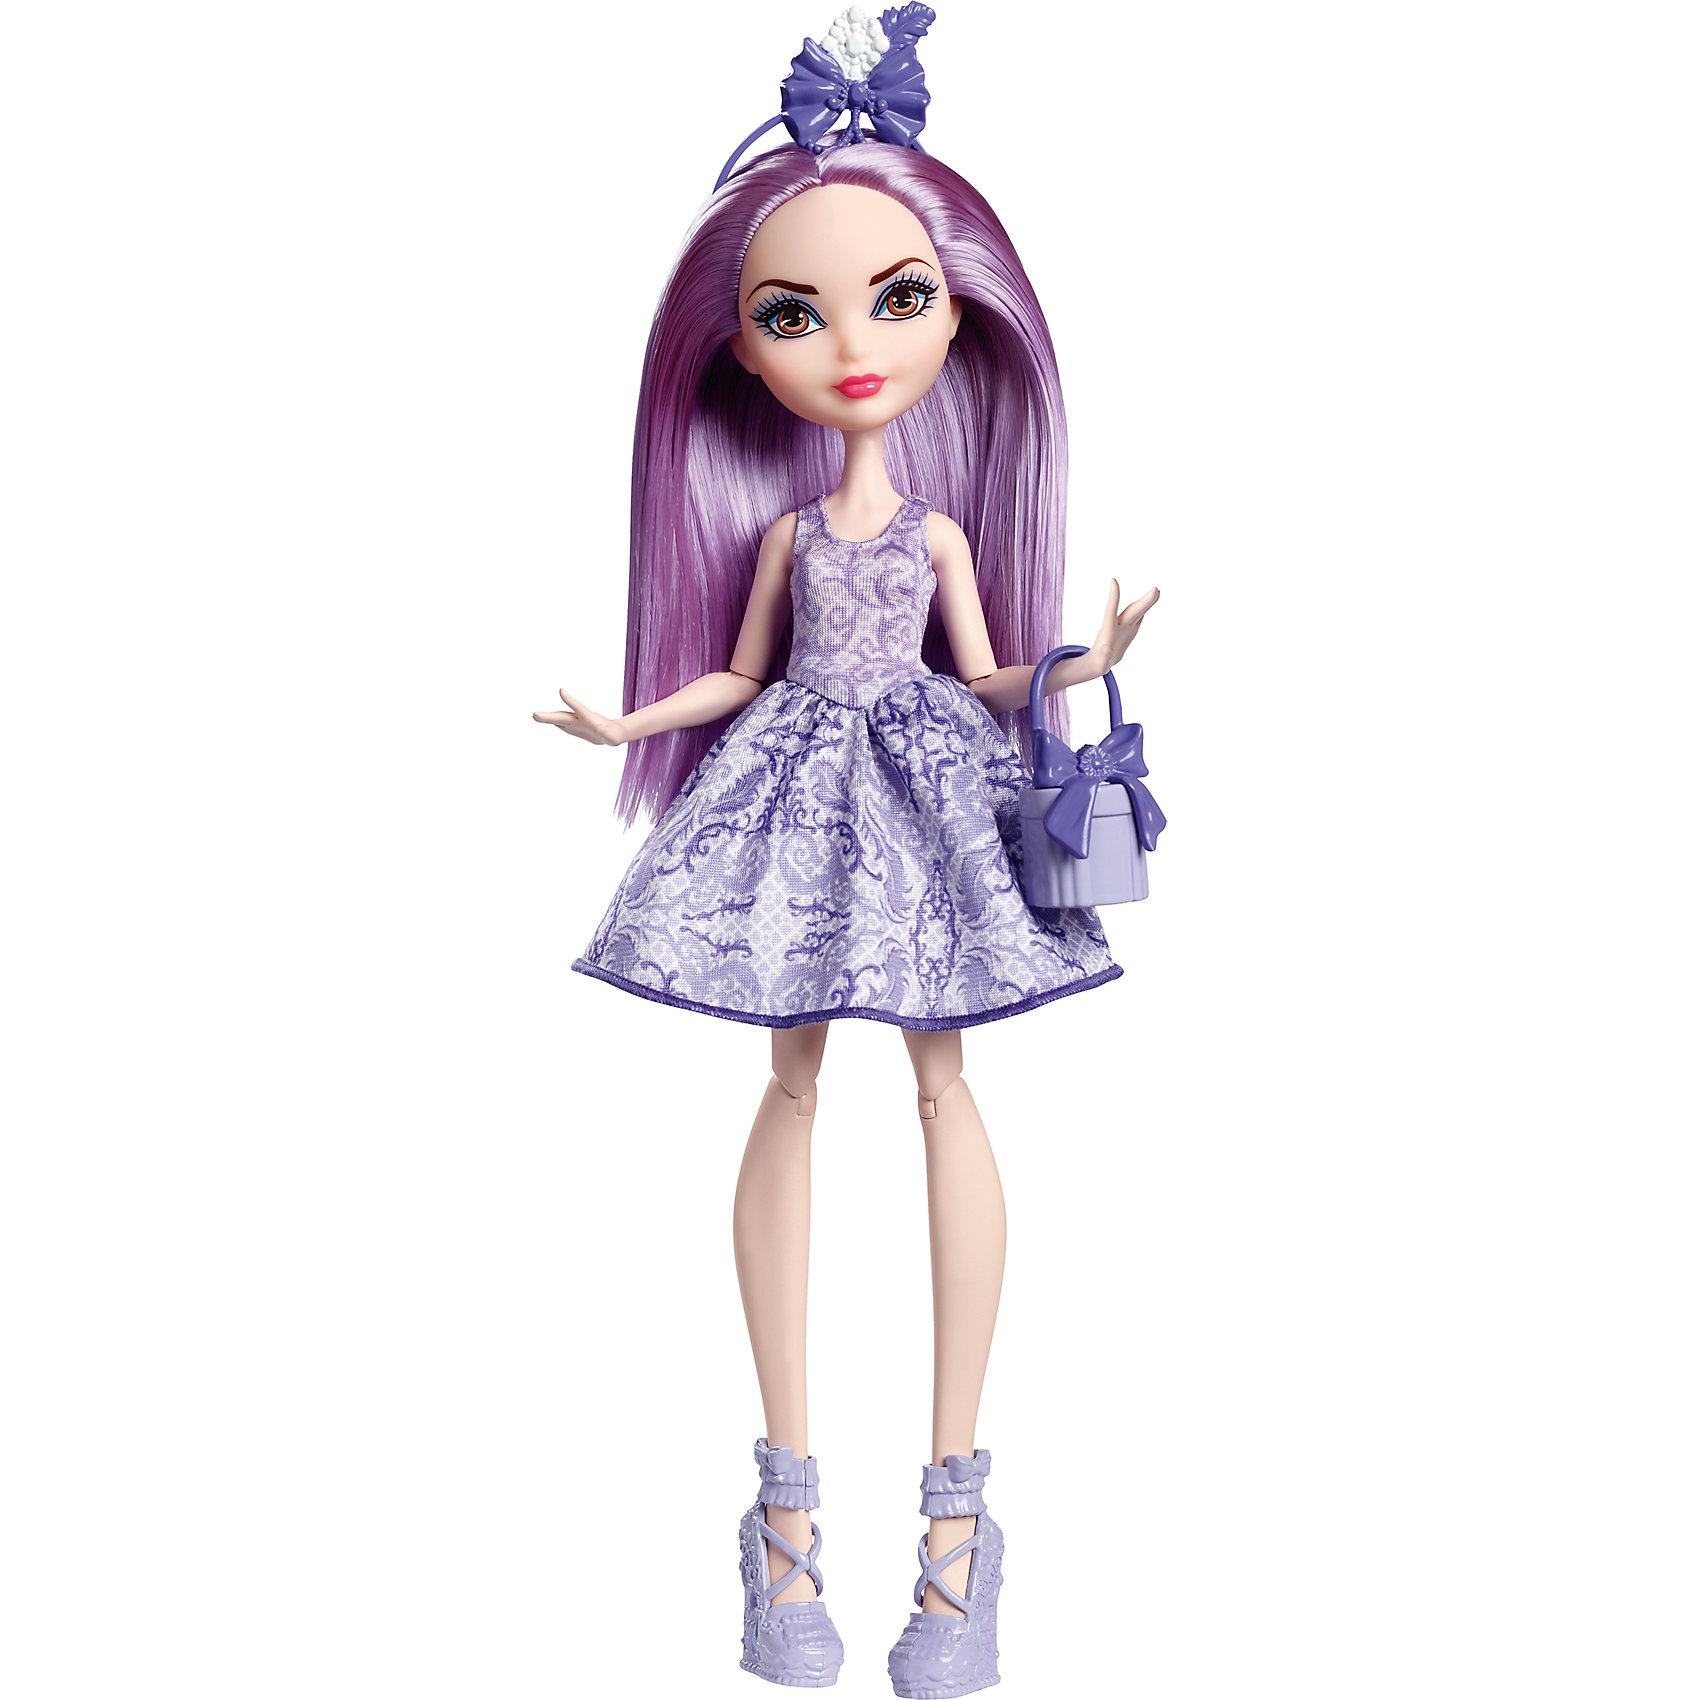 Mattel Кукла Дачесс Свон из серии Именинный бал, Ever After High mattel ever after high эшлин элла